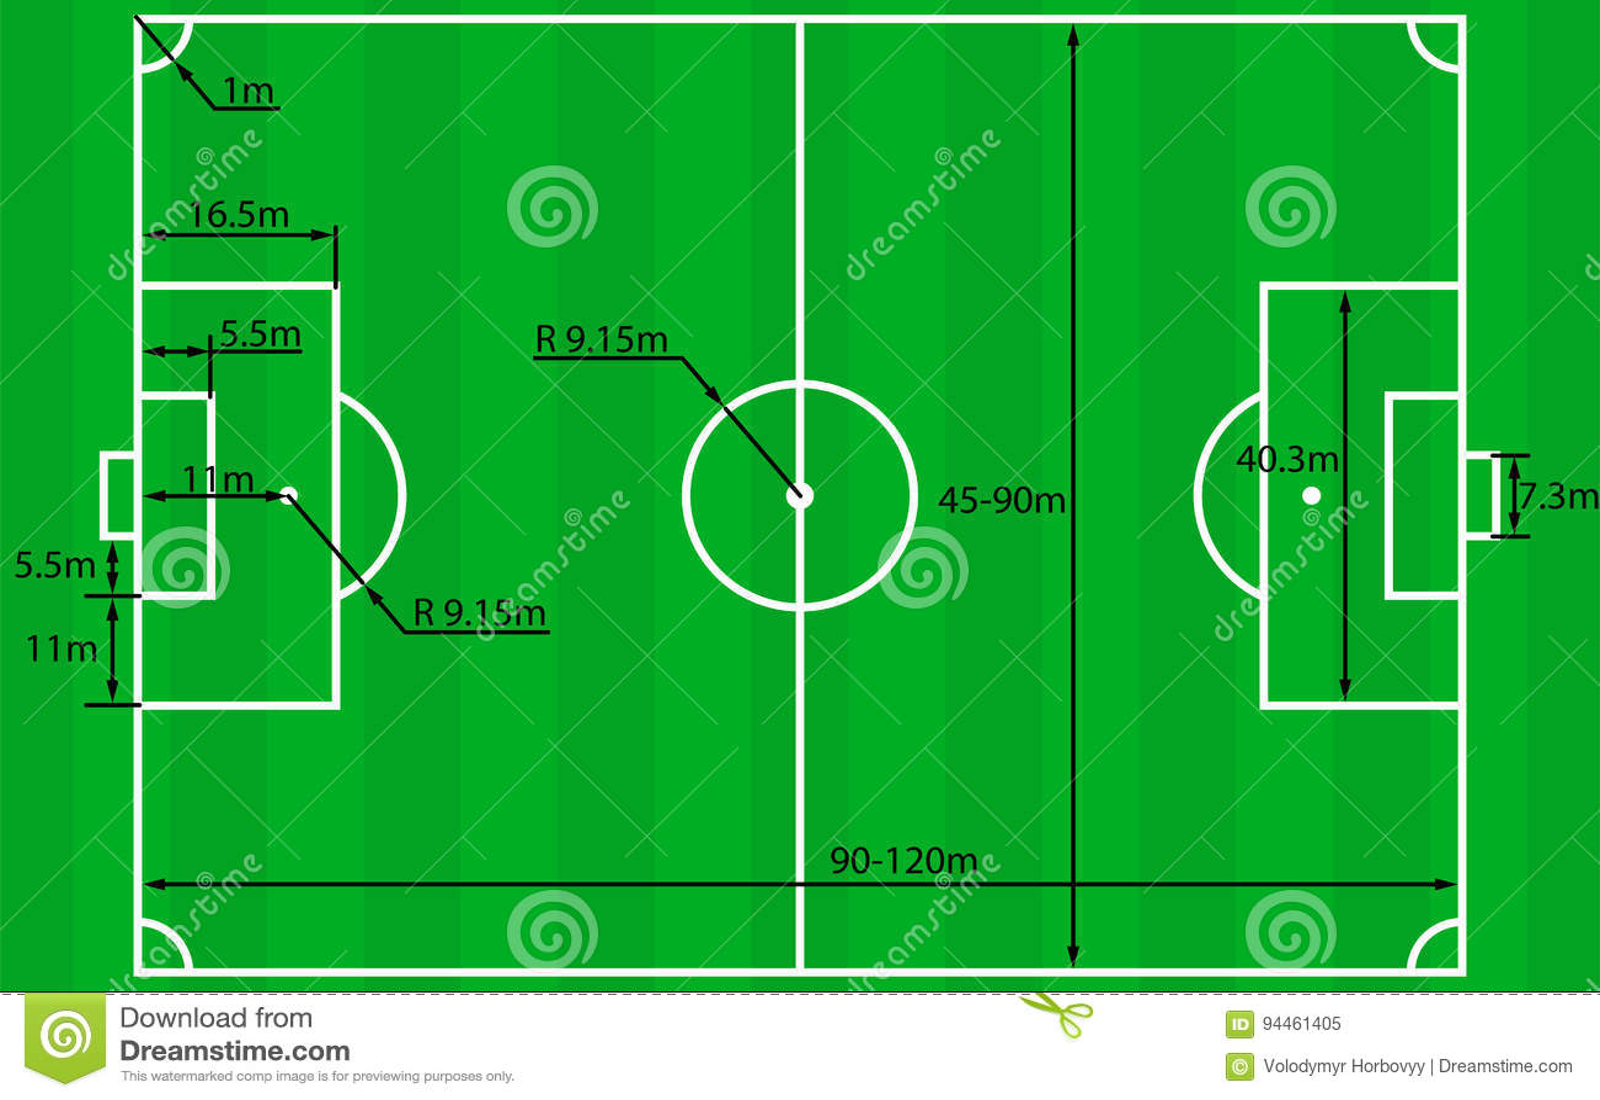 vecteur de plan de terrain de football illustration de vecteur illustration du football. Black Bedroom Furniture Sets. Home Design Ideas